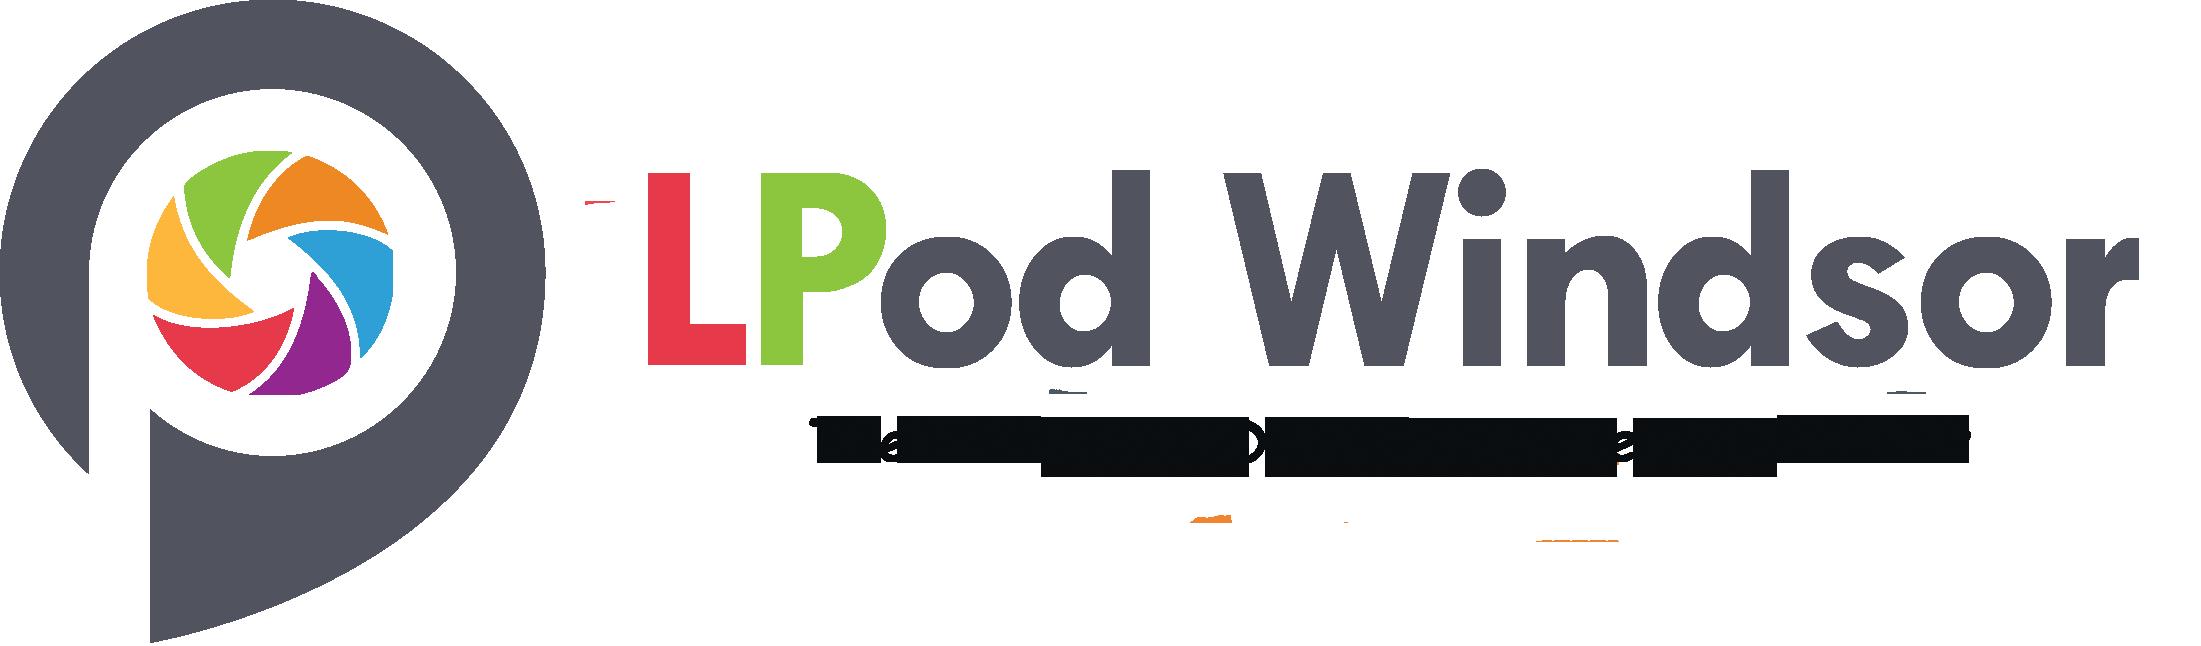 intensive driving courses windsor, intensive driving lessons windsor, intensive driving school windsor